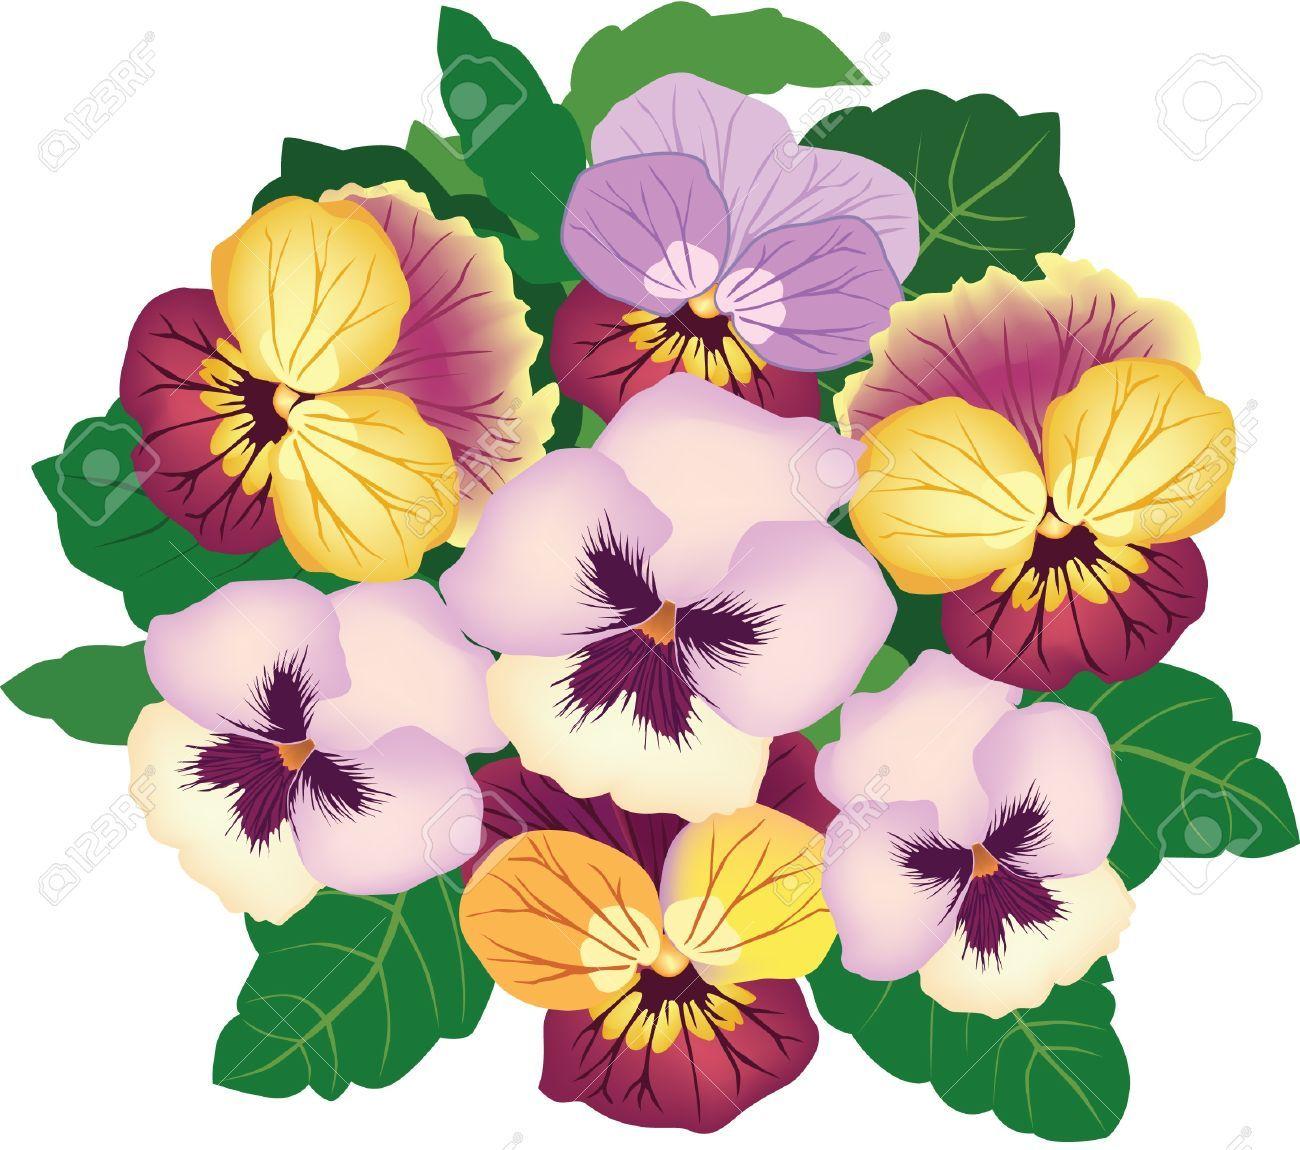 Nurcan Cuceoglu Pansies Flowers Flowers Bouquet